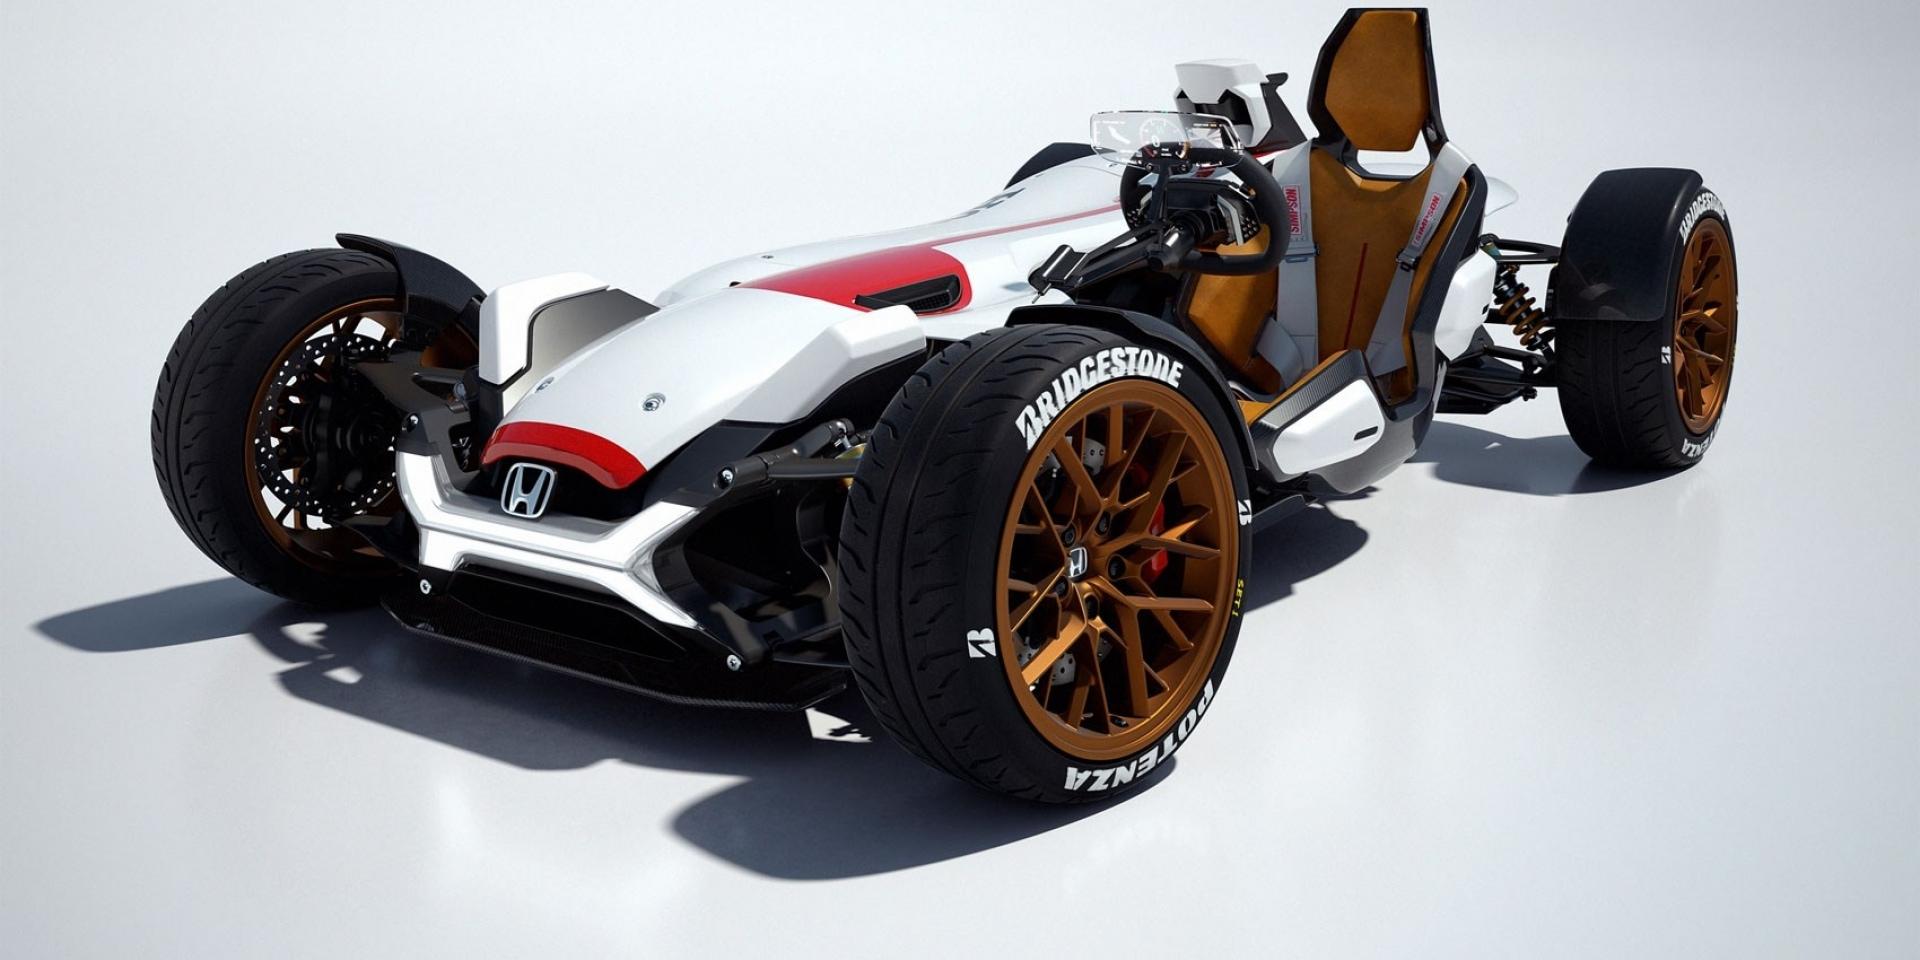 HONDA RCV 四輪版即將量產?LIGHTWEIGHT PROJECT 2&4最新專利圖曝光